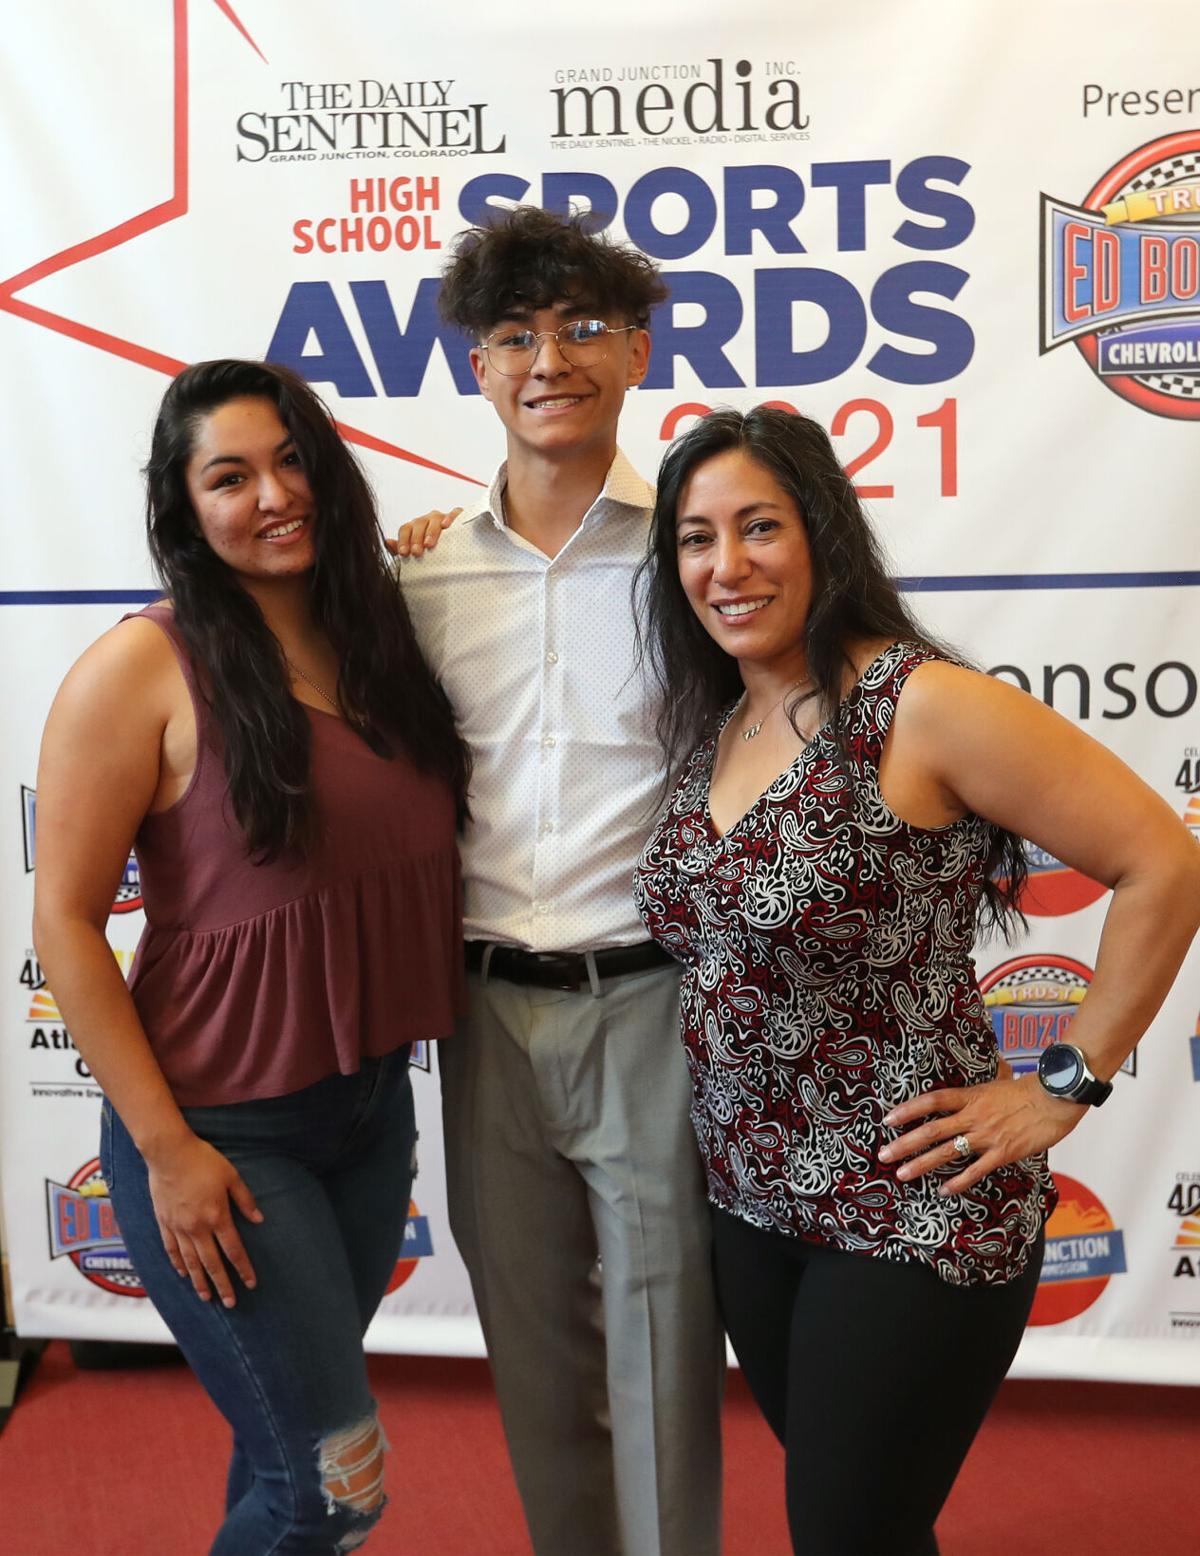 060921-Sports Awards 32-CPT.jpg